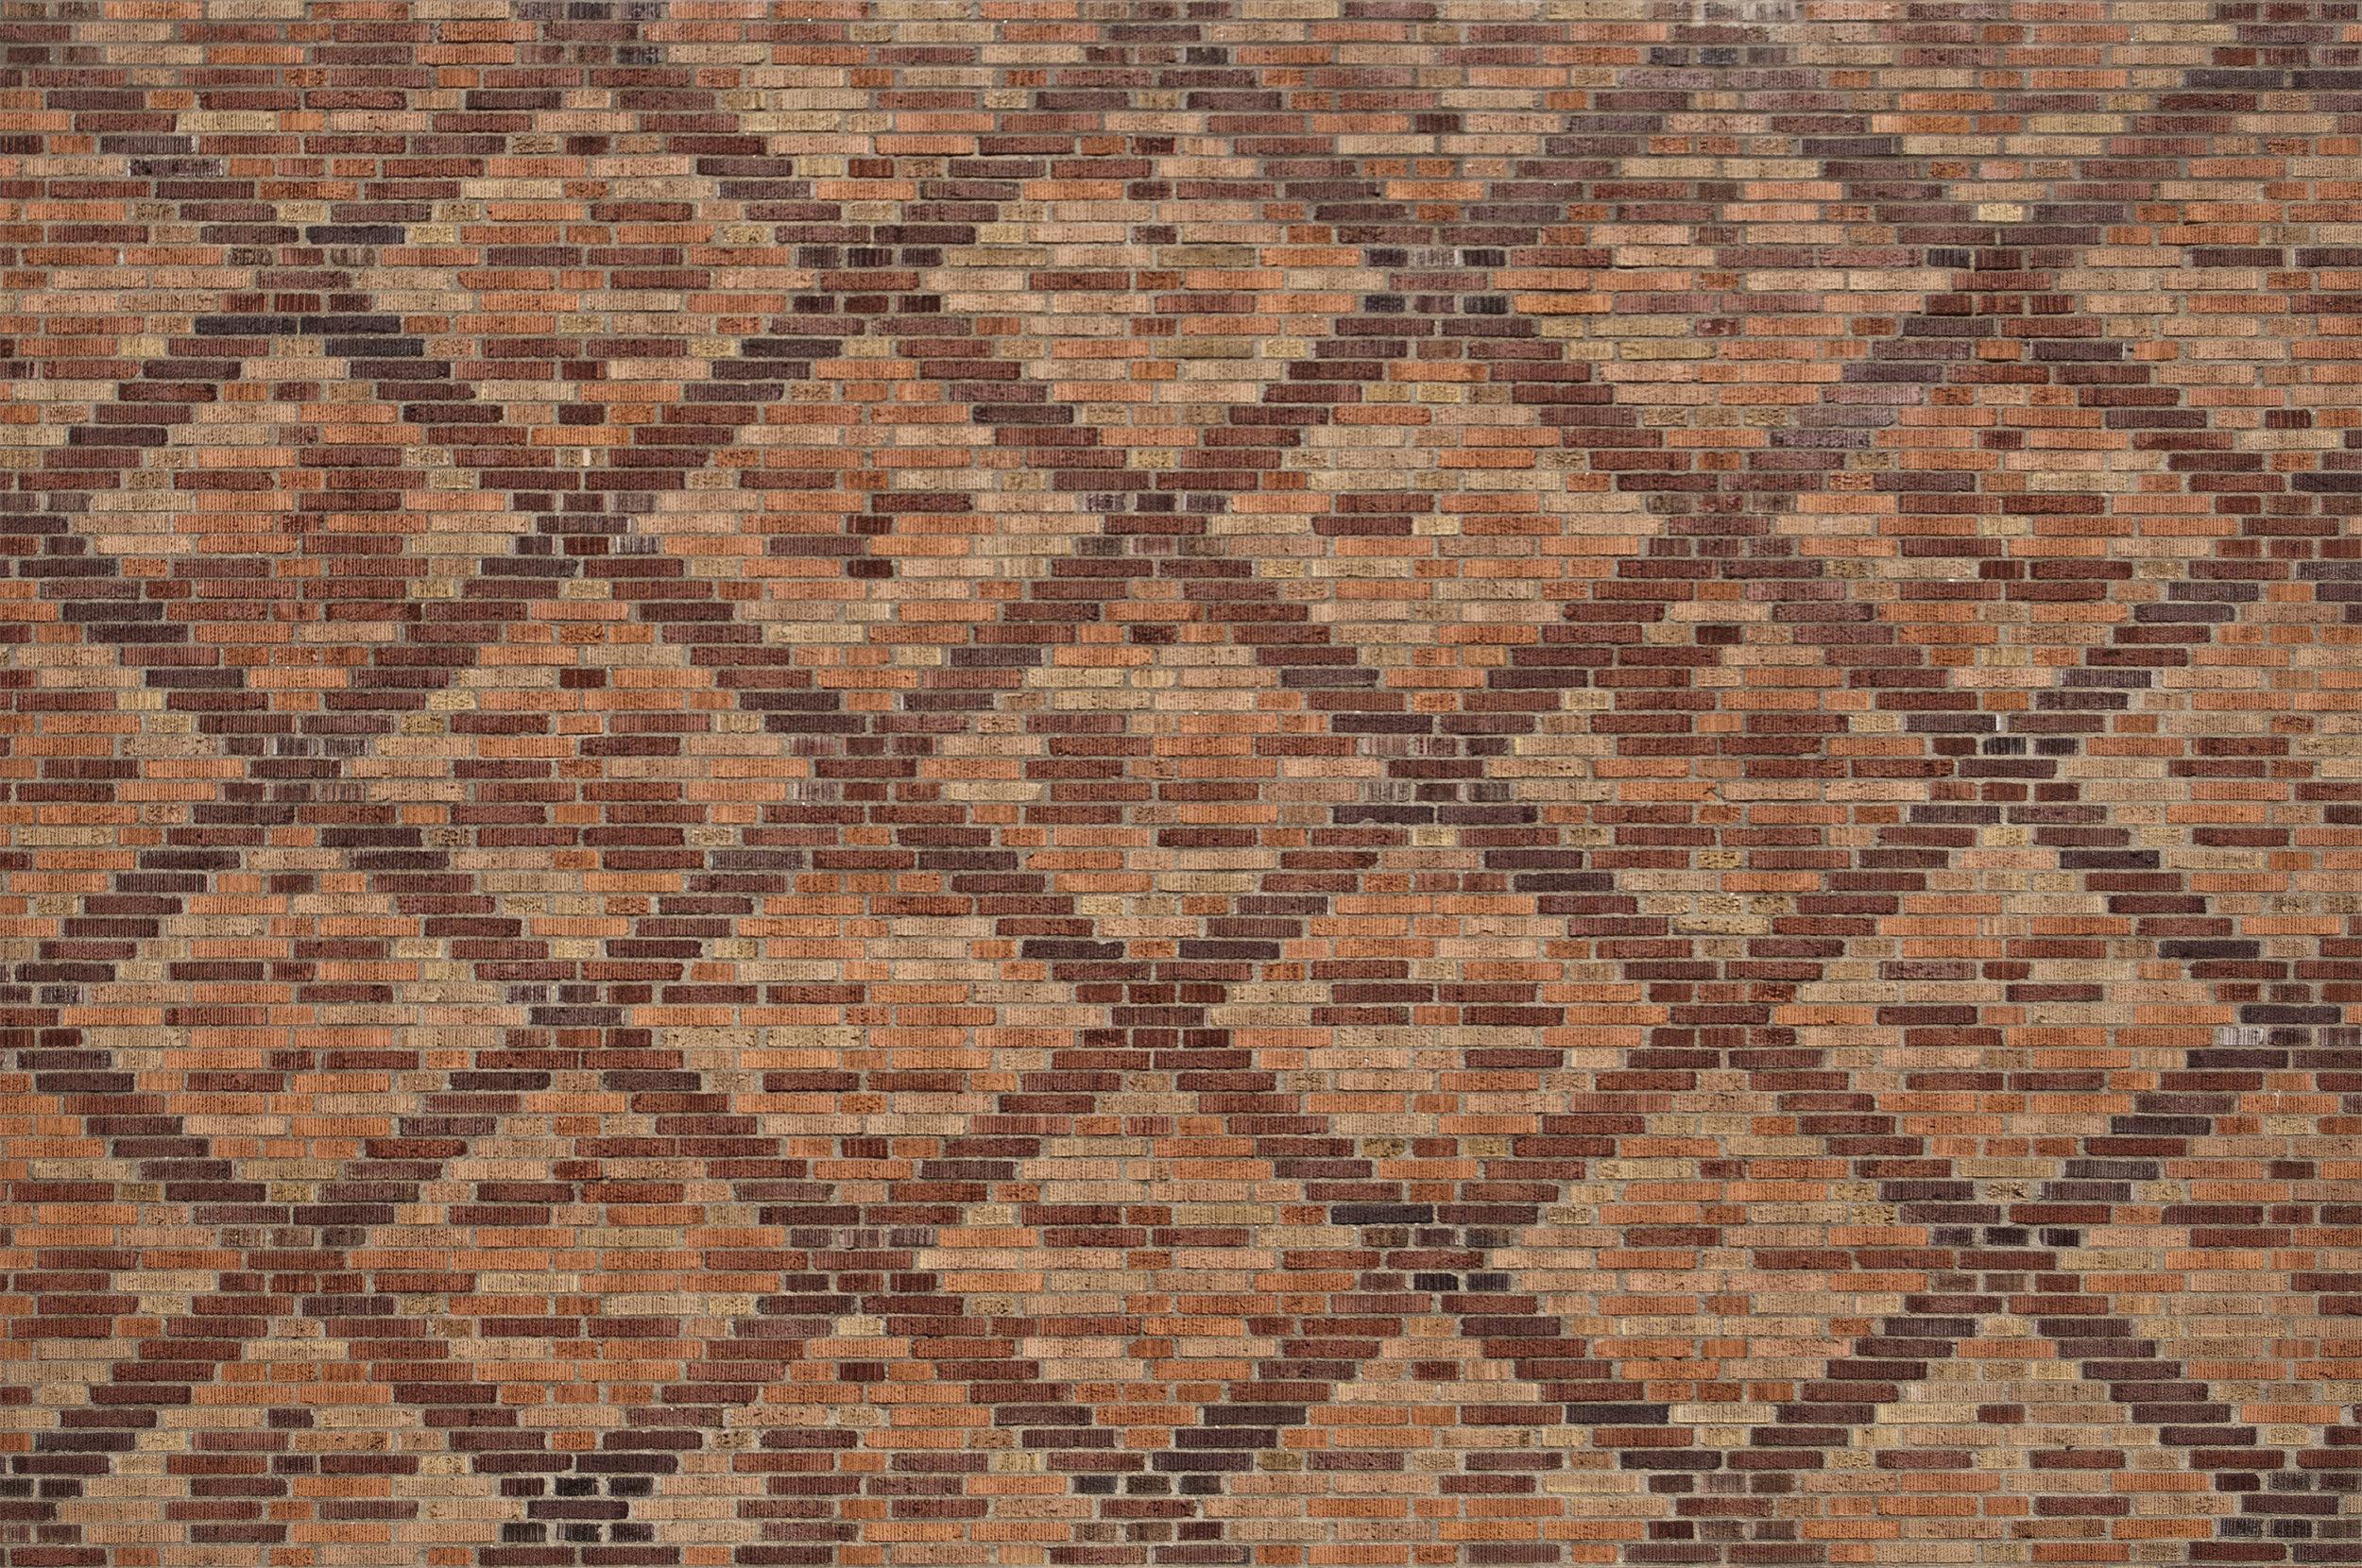 4 Unique Brick Laying Patterns That Add Interest To Any Masonry